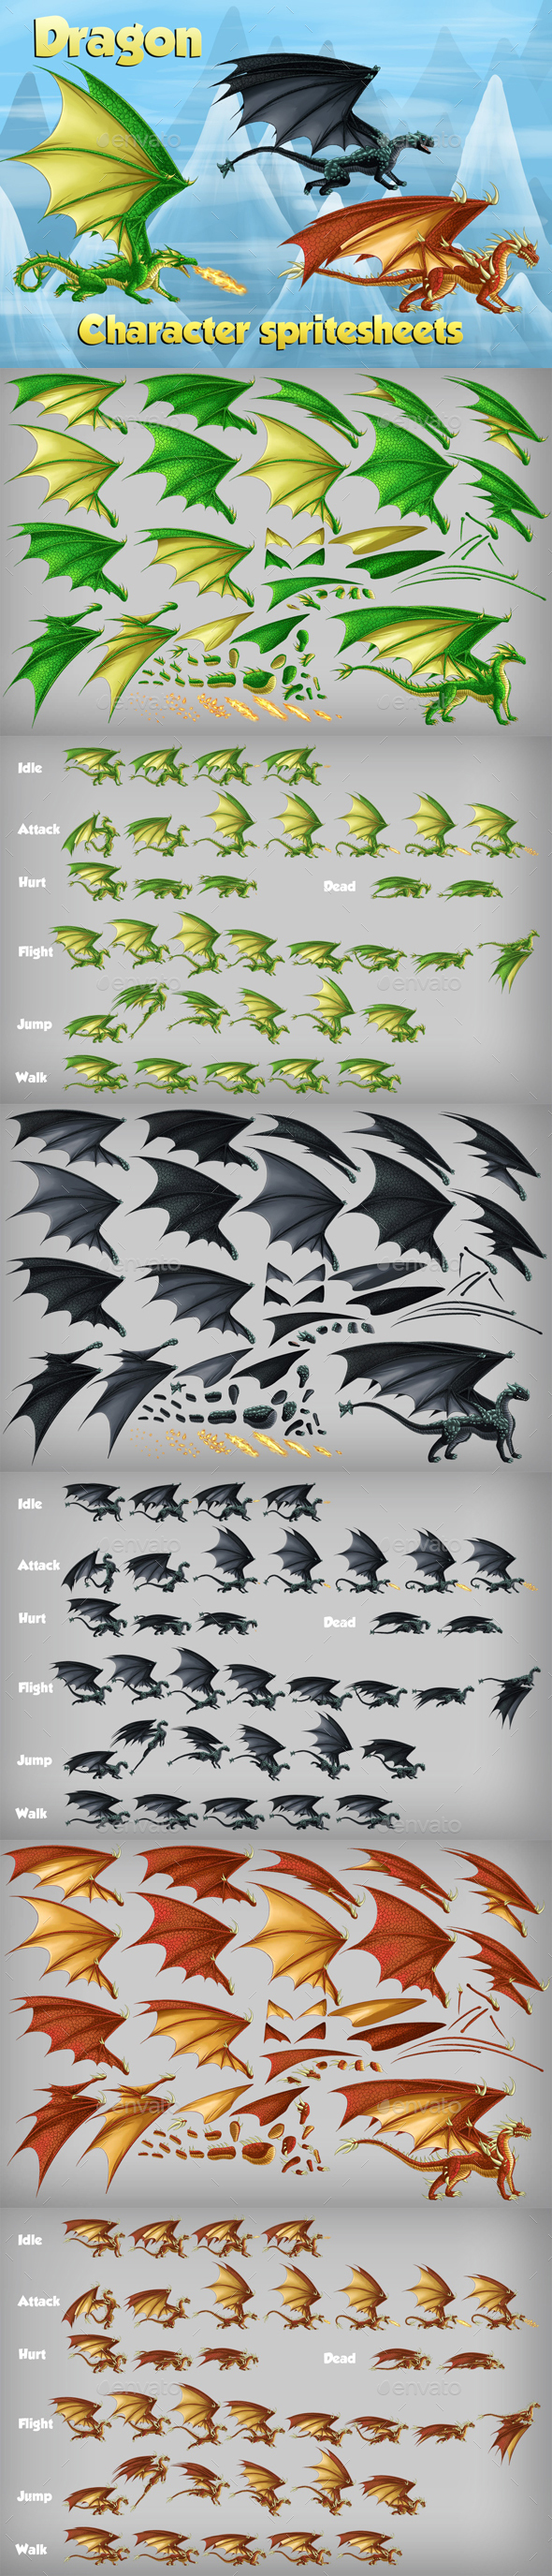 2D Game Dragon Character Spritesheet (Sprites)